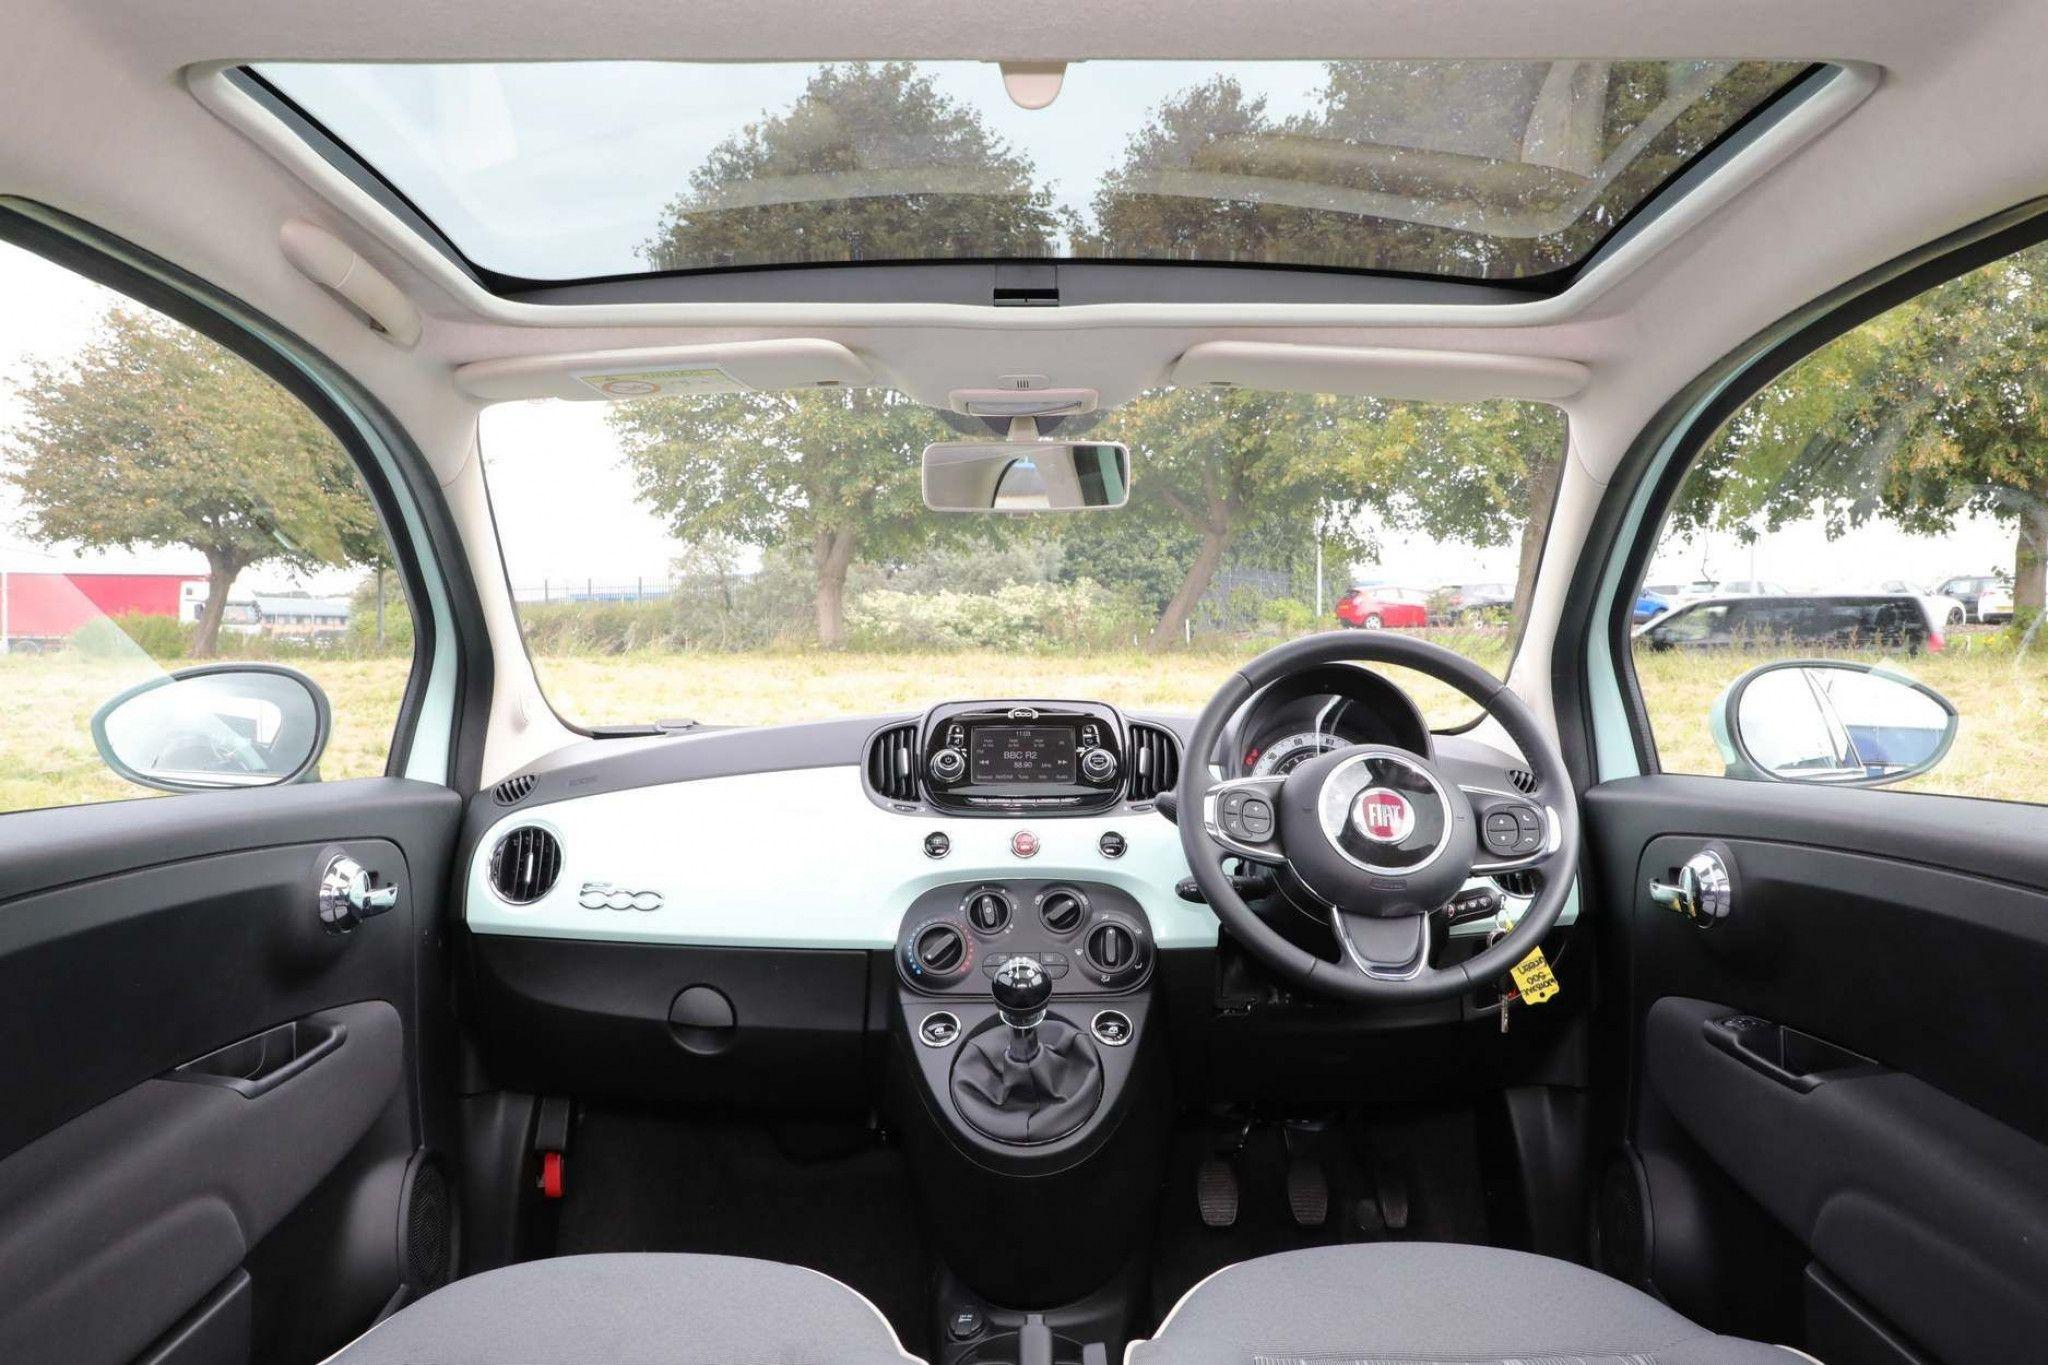 Fiat 500 1 2 Lounge 3dr In 2020 Fiat 500 Fiat Lounge